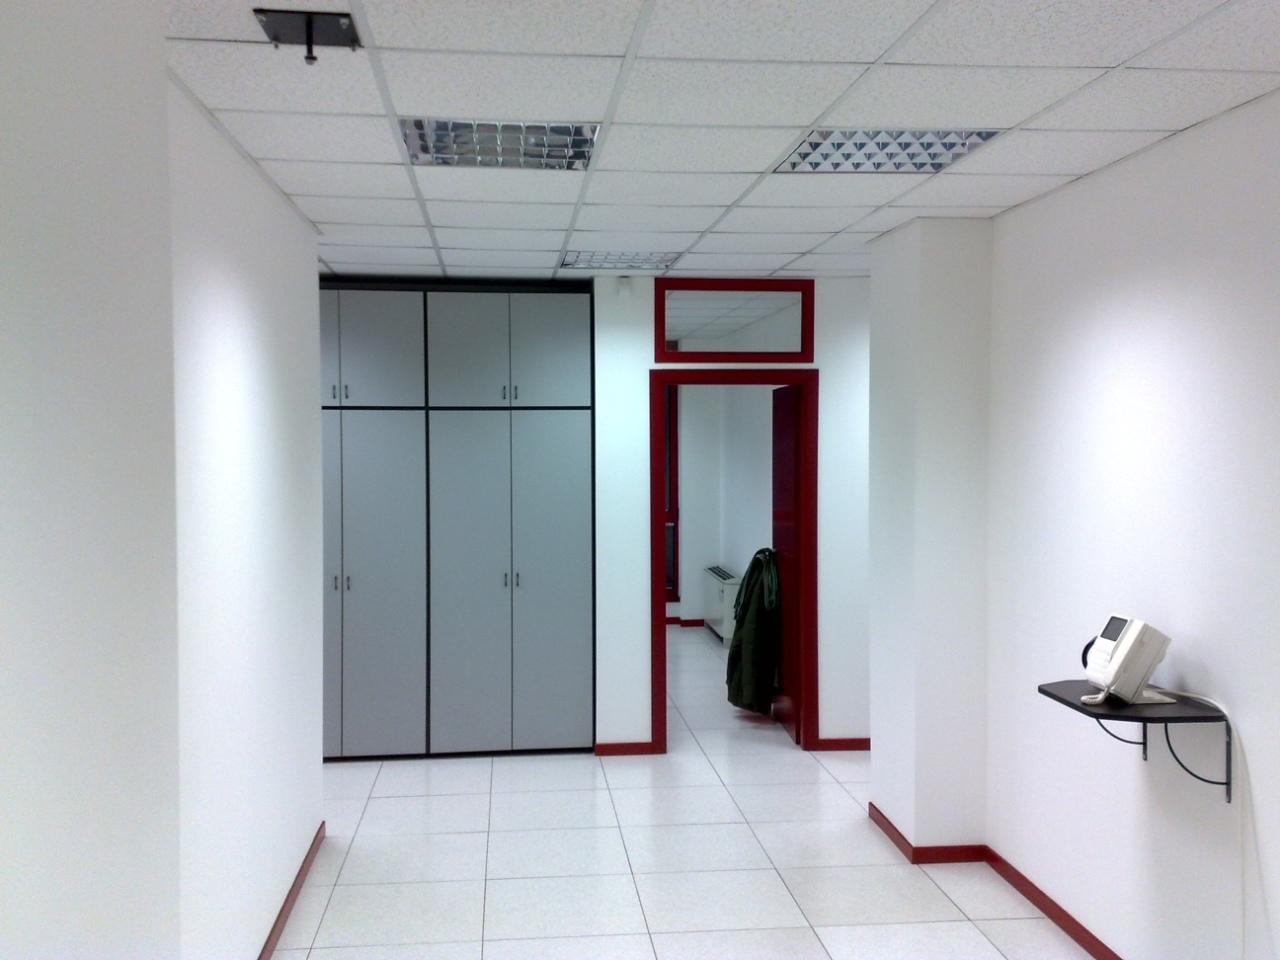 Ufficio a Parma Città Est, Parma Rif. 11221690